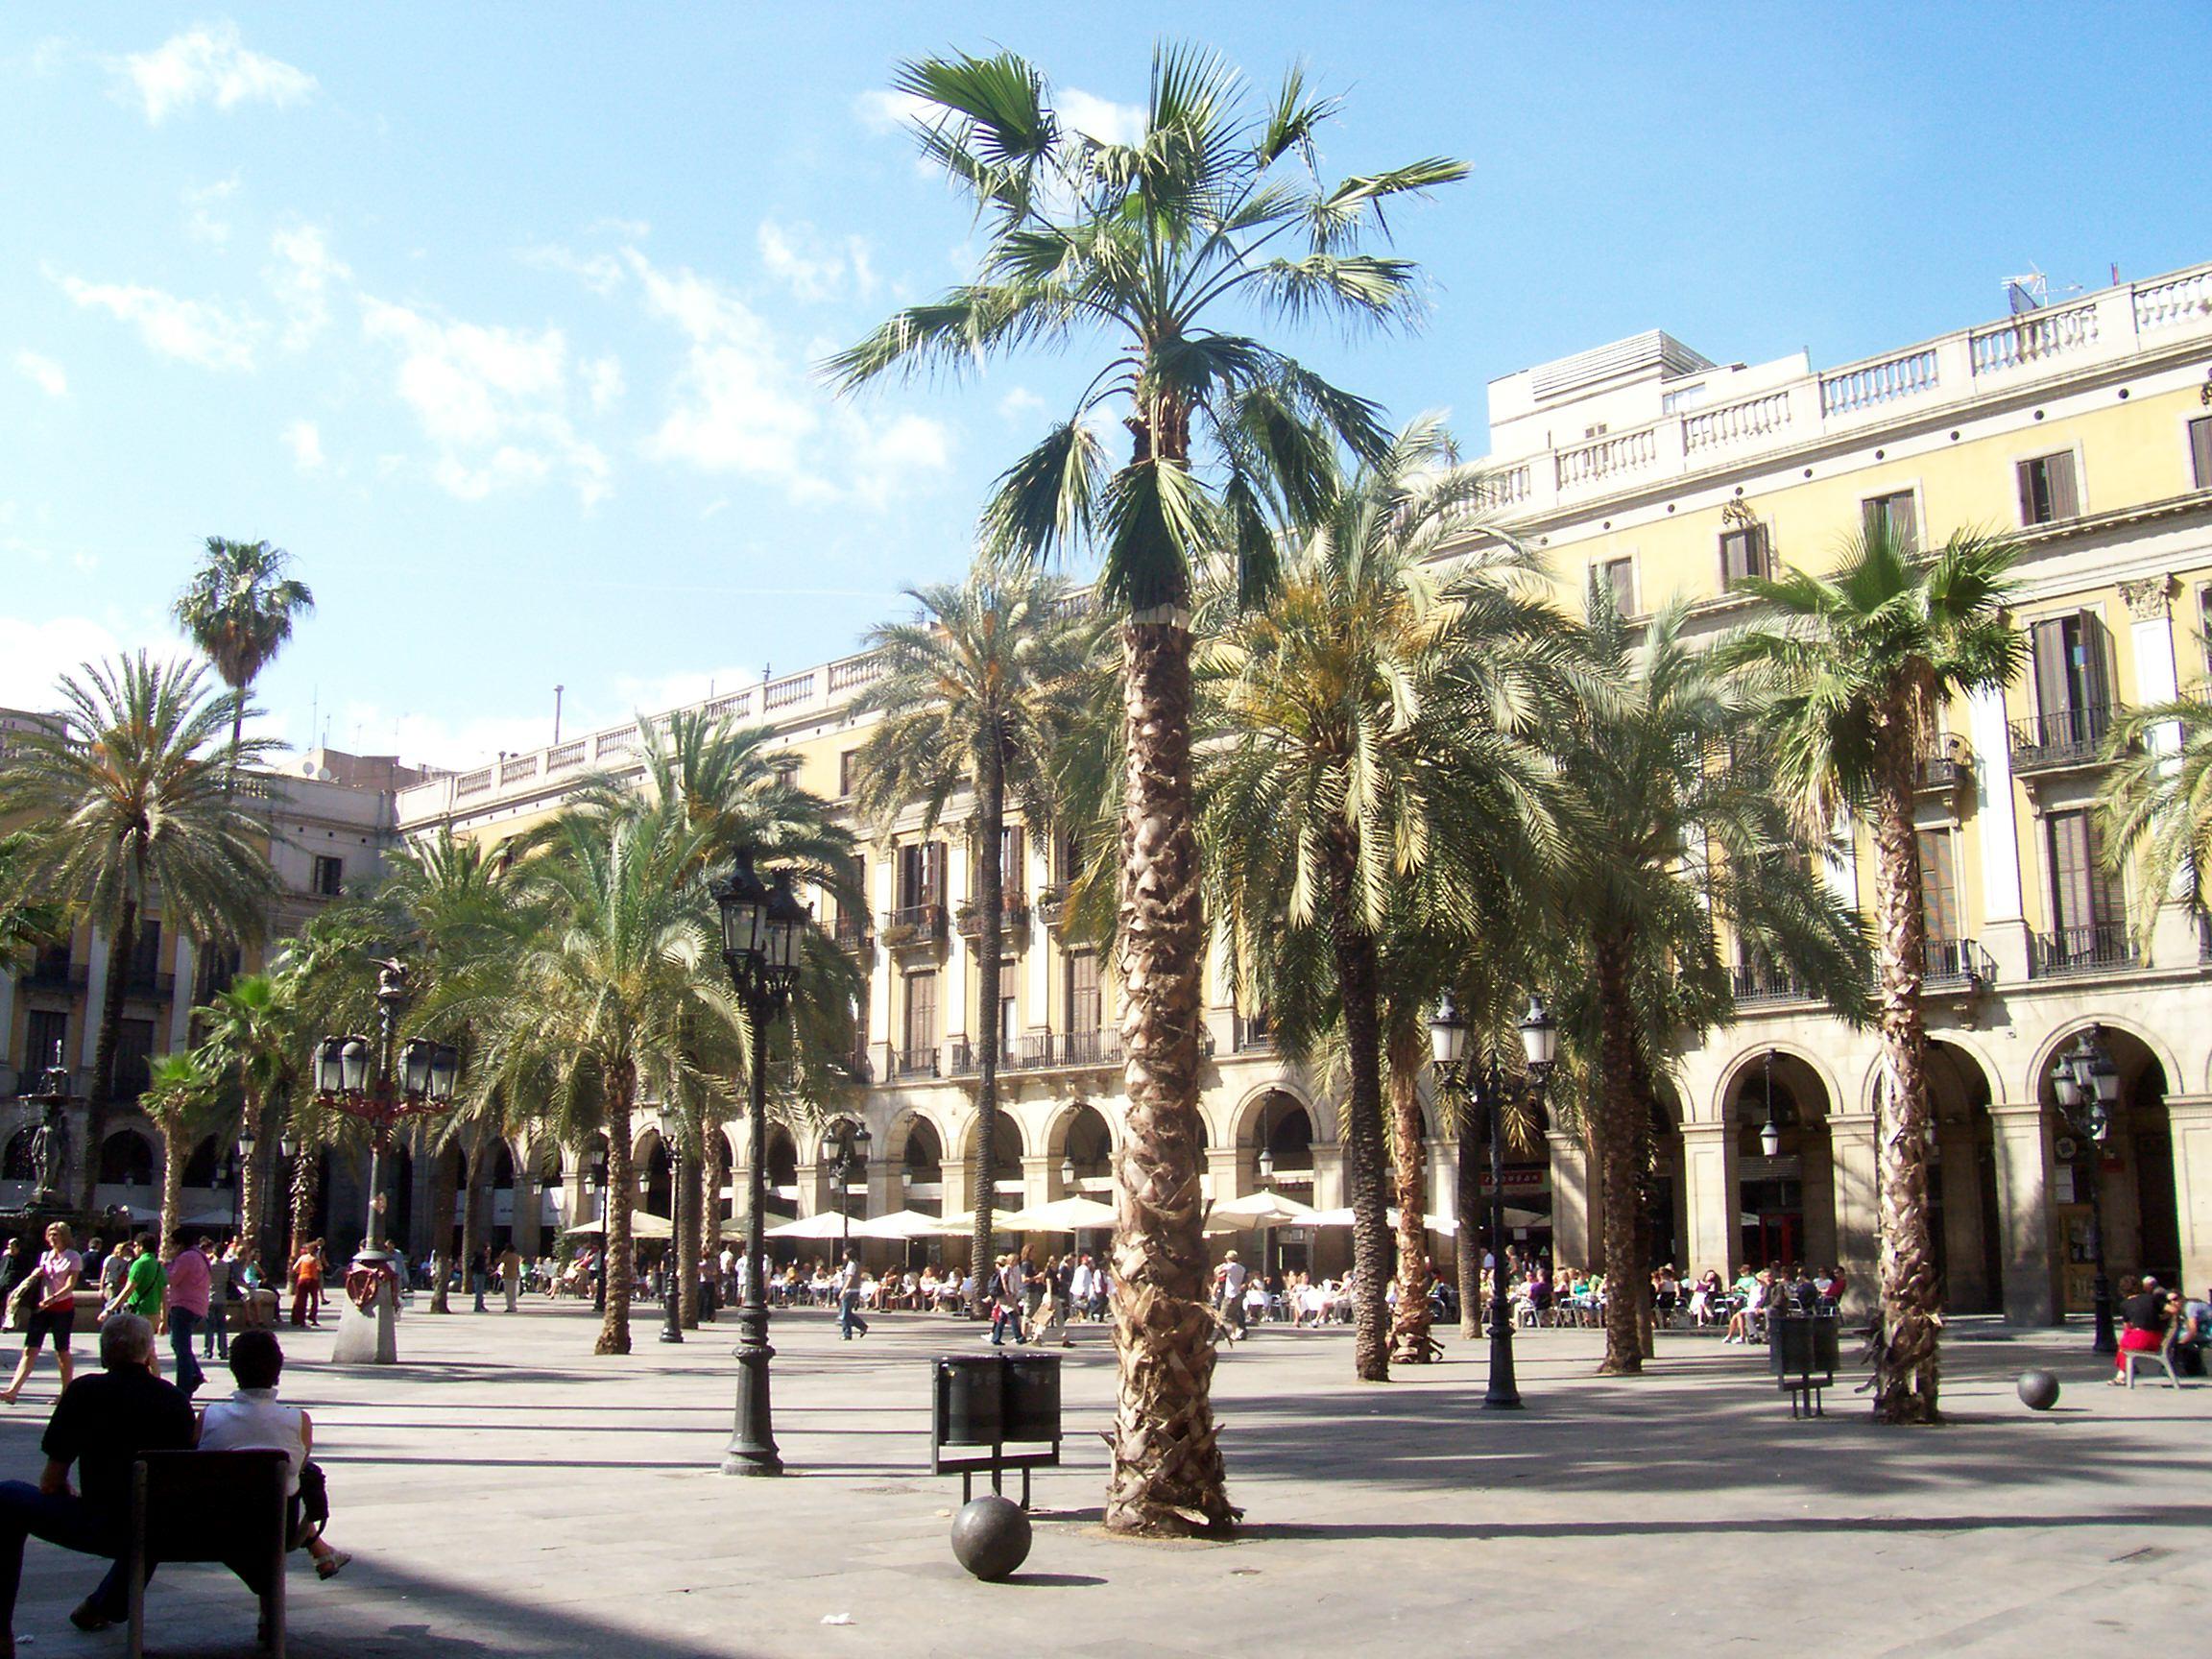 barcelona_platz.jpg - 725,52 kB